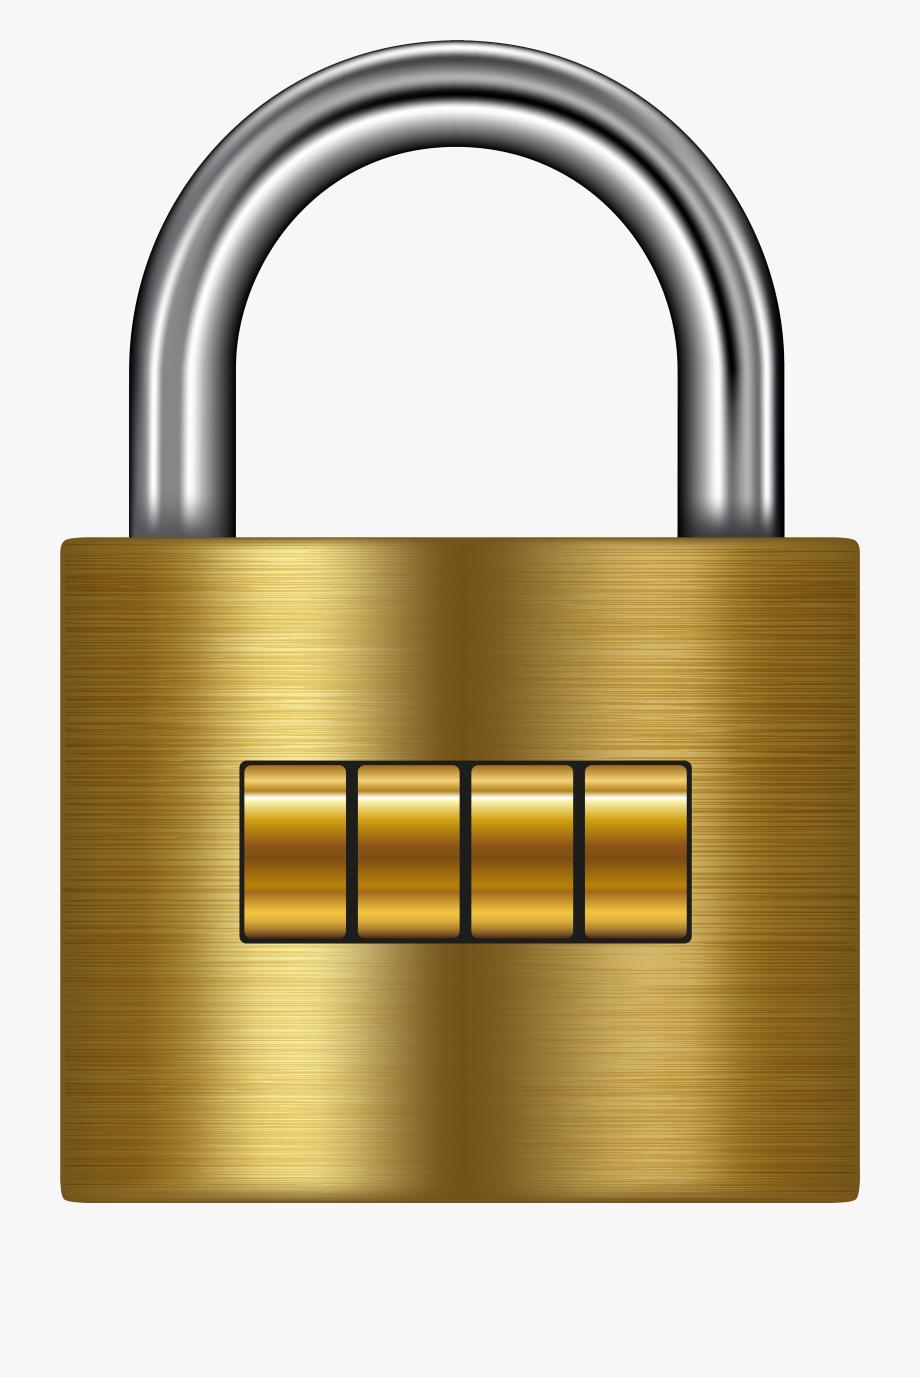 Lock clipart cute. Gold png clip art